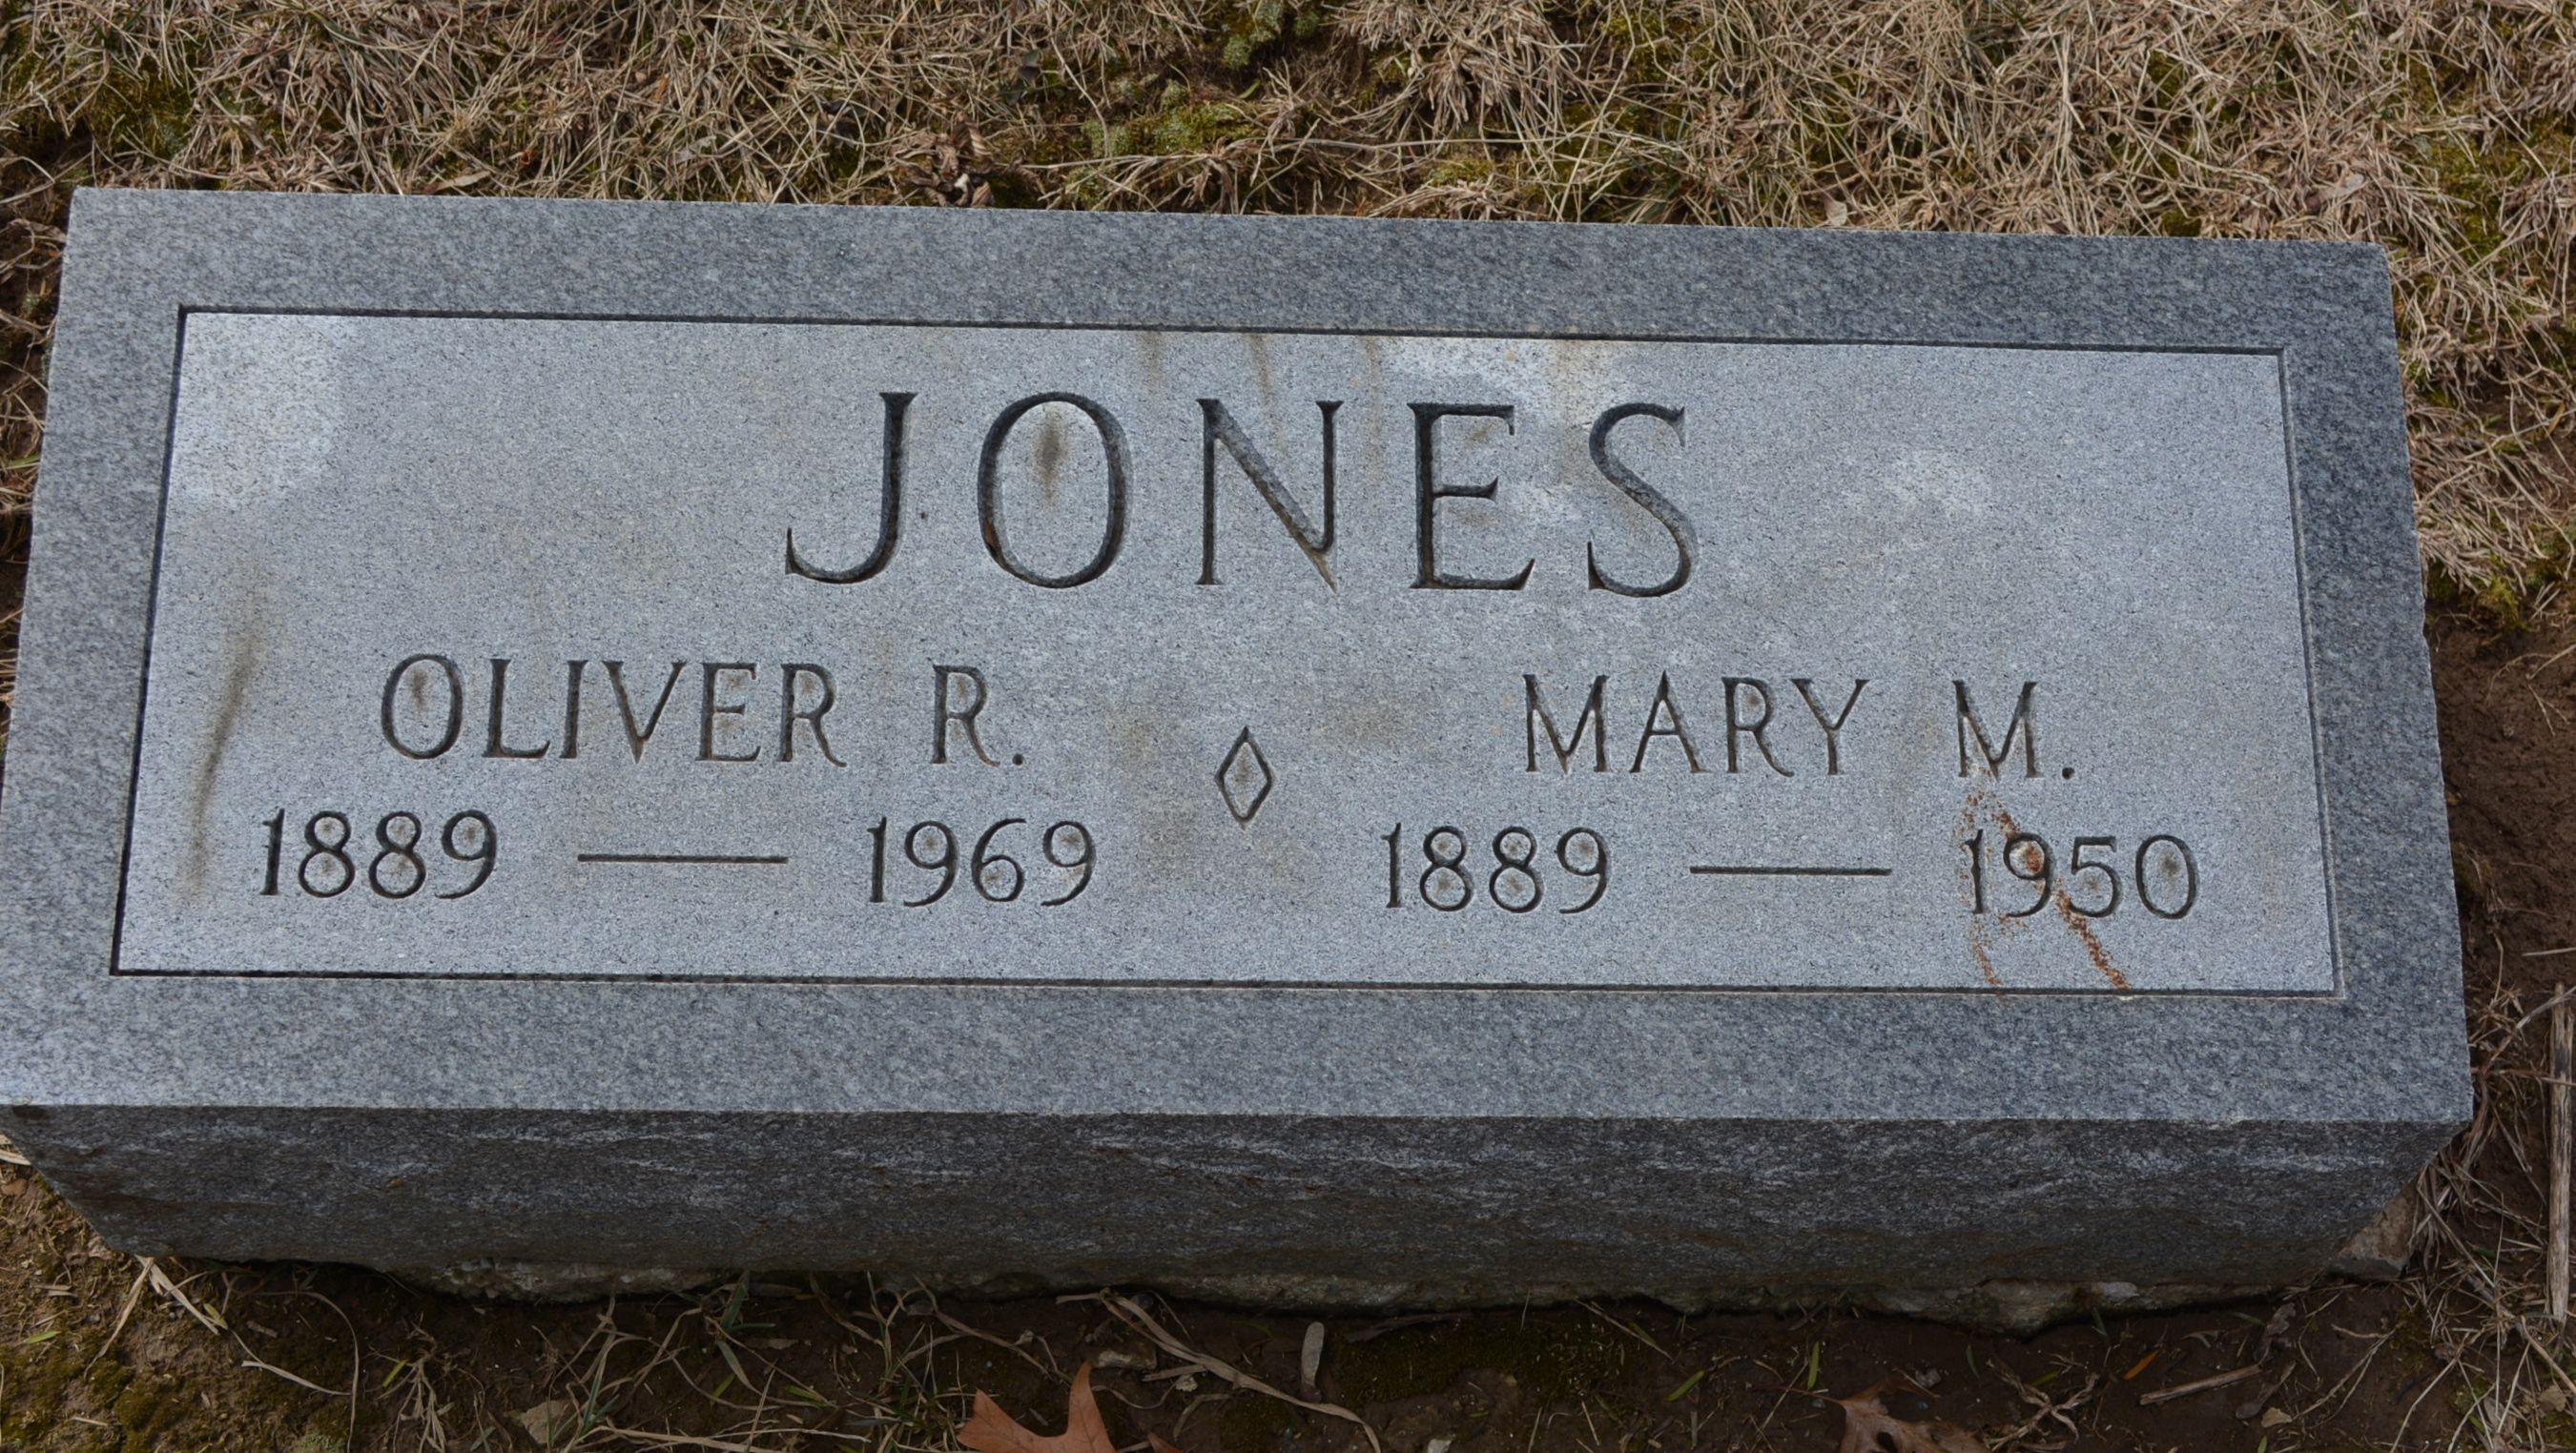 Roger F Jones